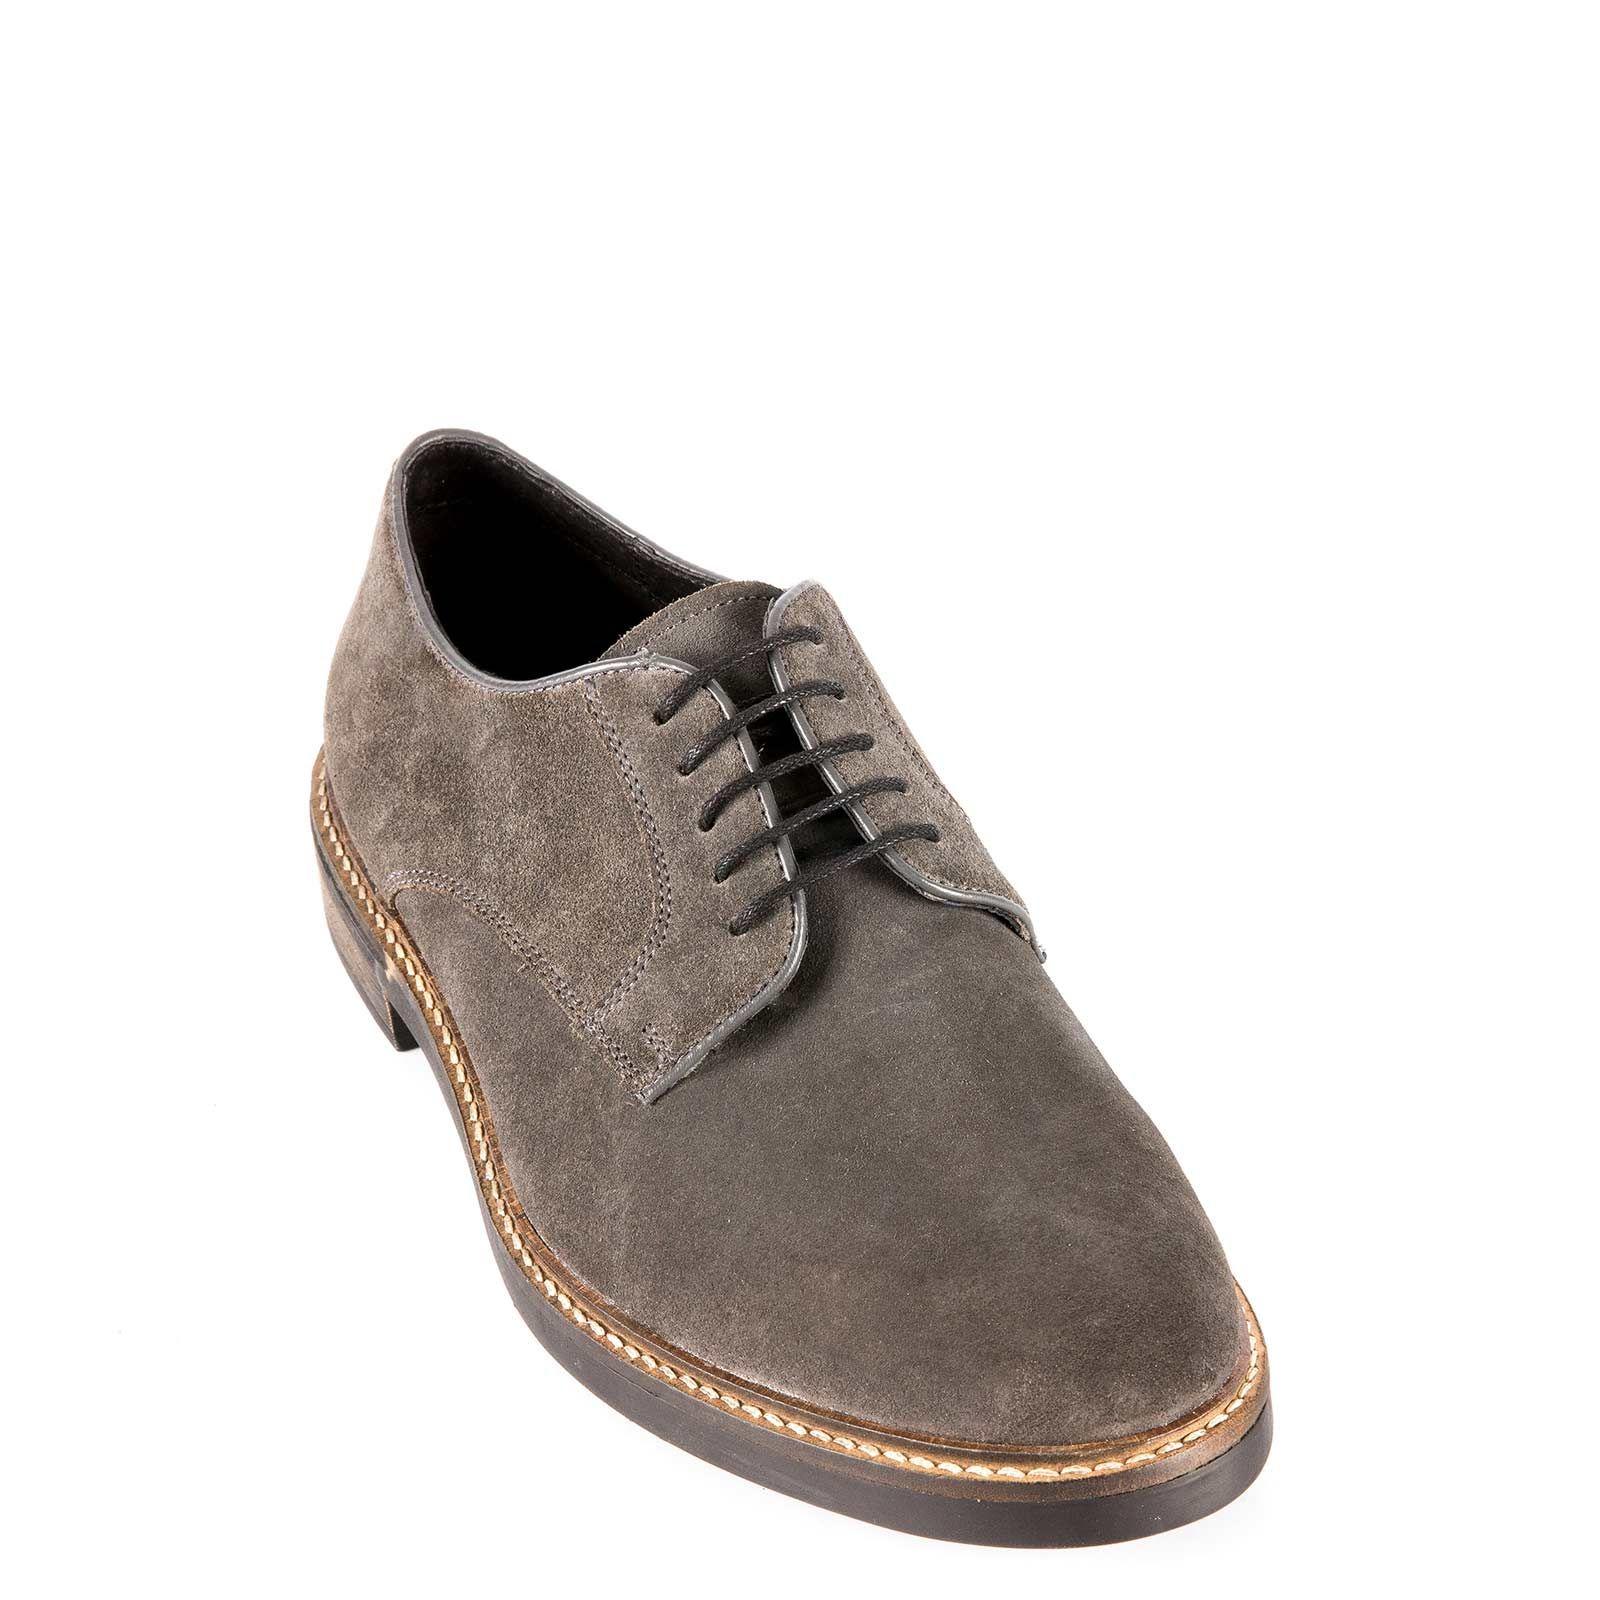 Men's grey leather Oxford UV509-M15 < Men's Oxfords Shoes| MIGATO